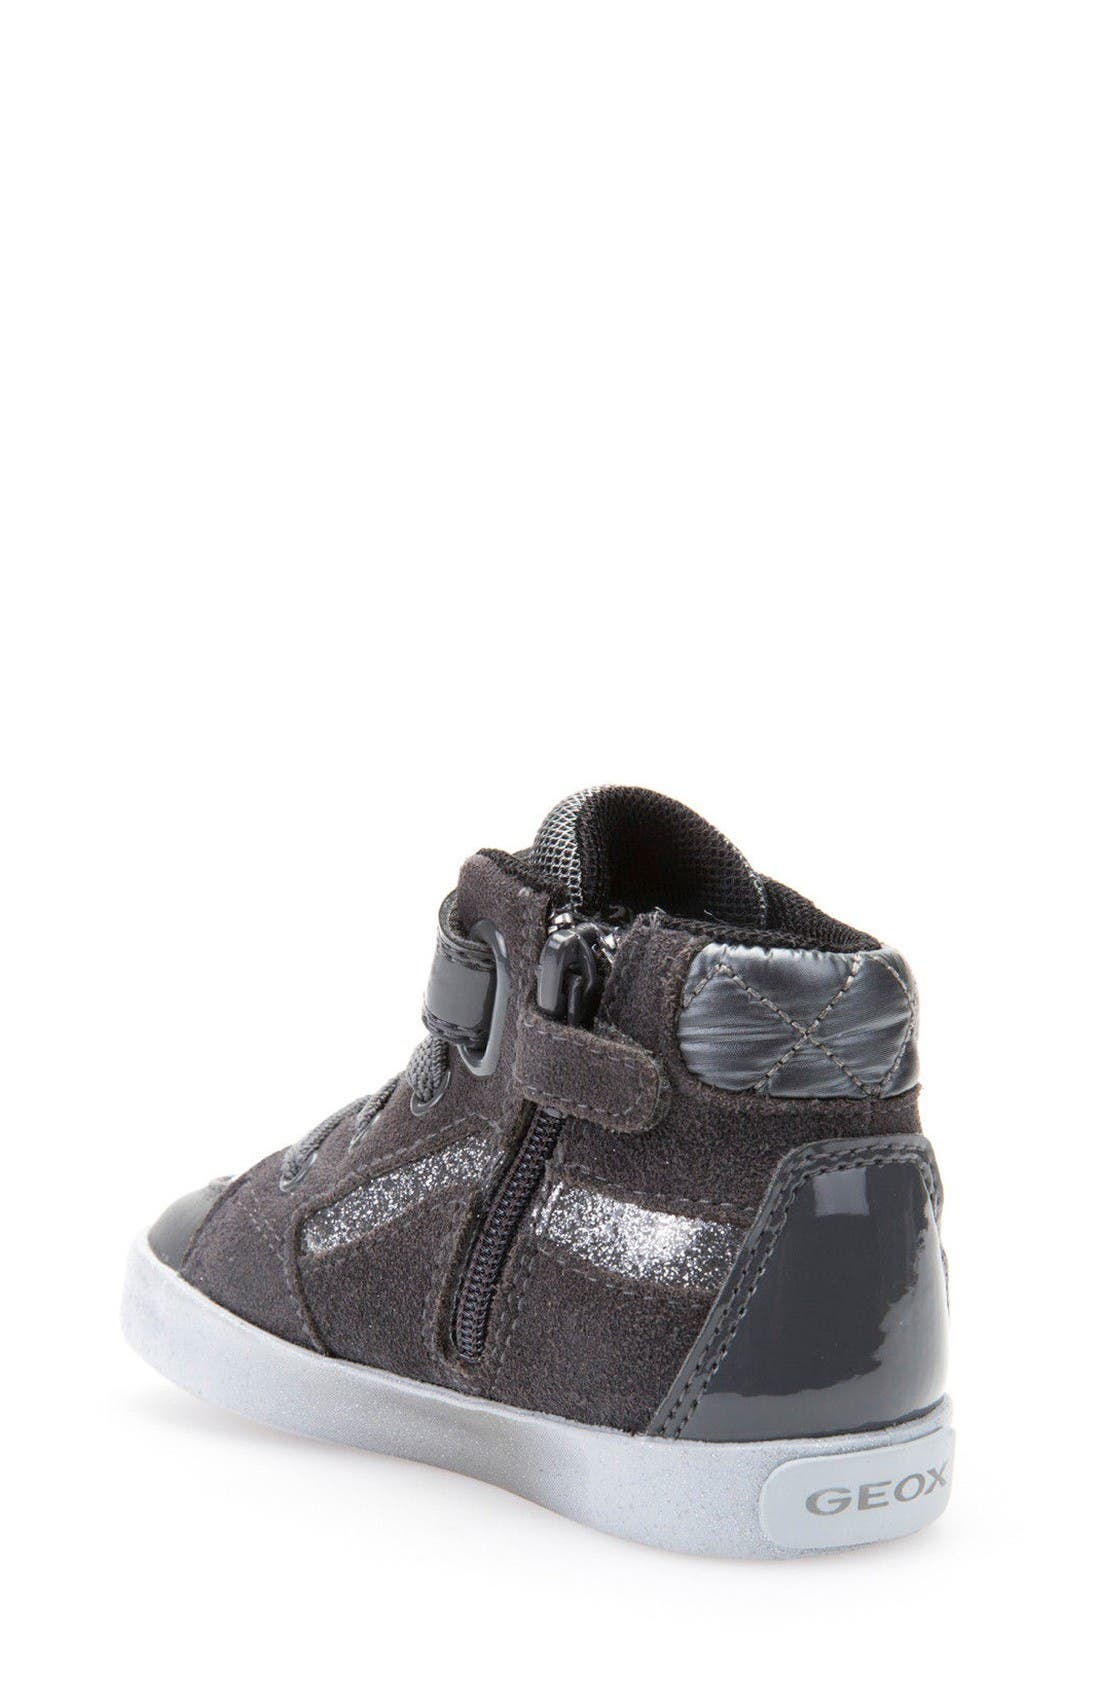 Kiwi Studded High Top Sneaker,                             Alternate thumbnail 2, color,                             Dark Grey